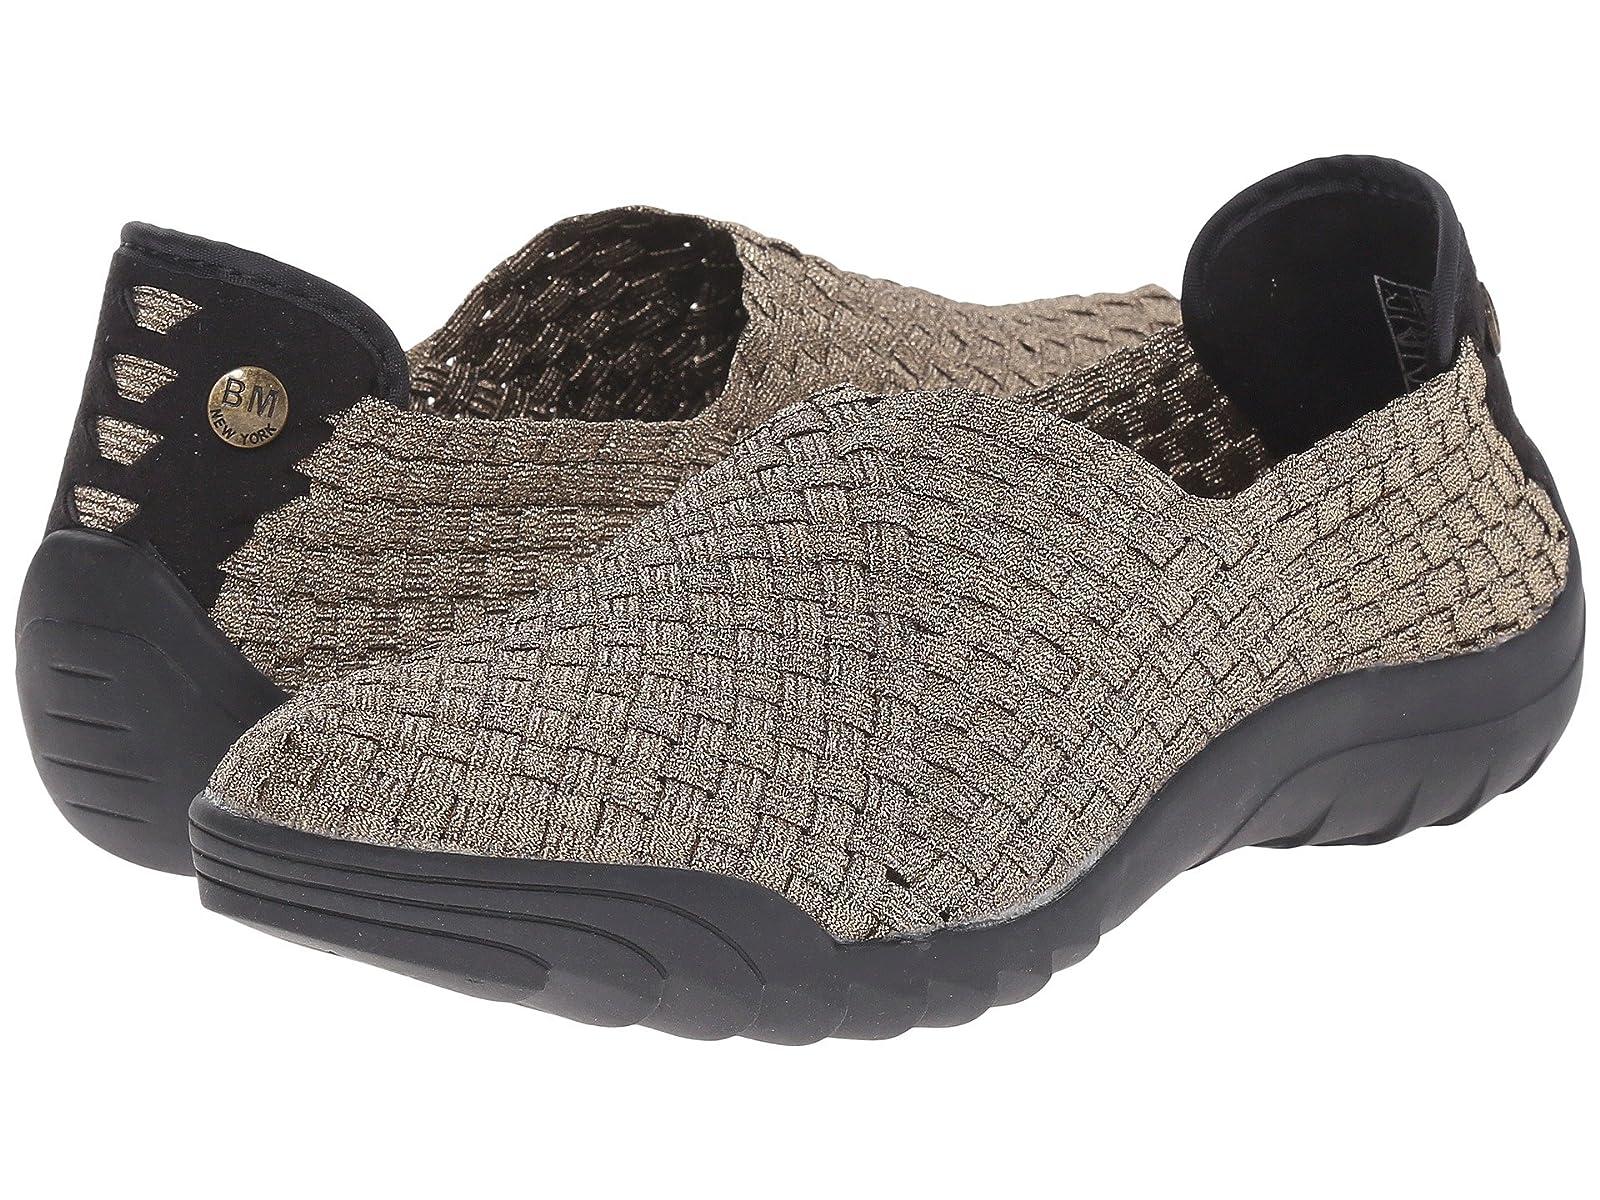 bernie mev. Rigged JimAtmospheric grades have affordable shoes